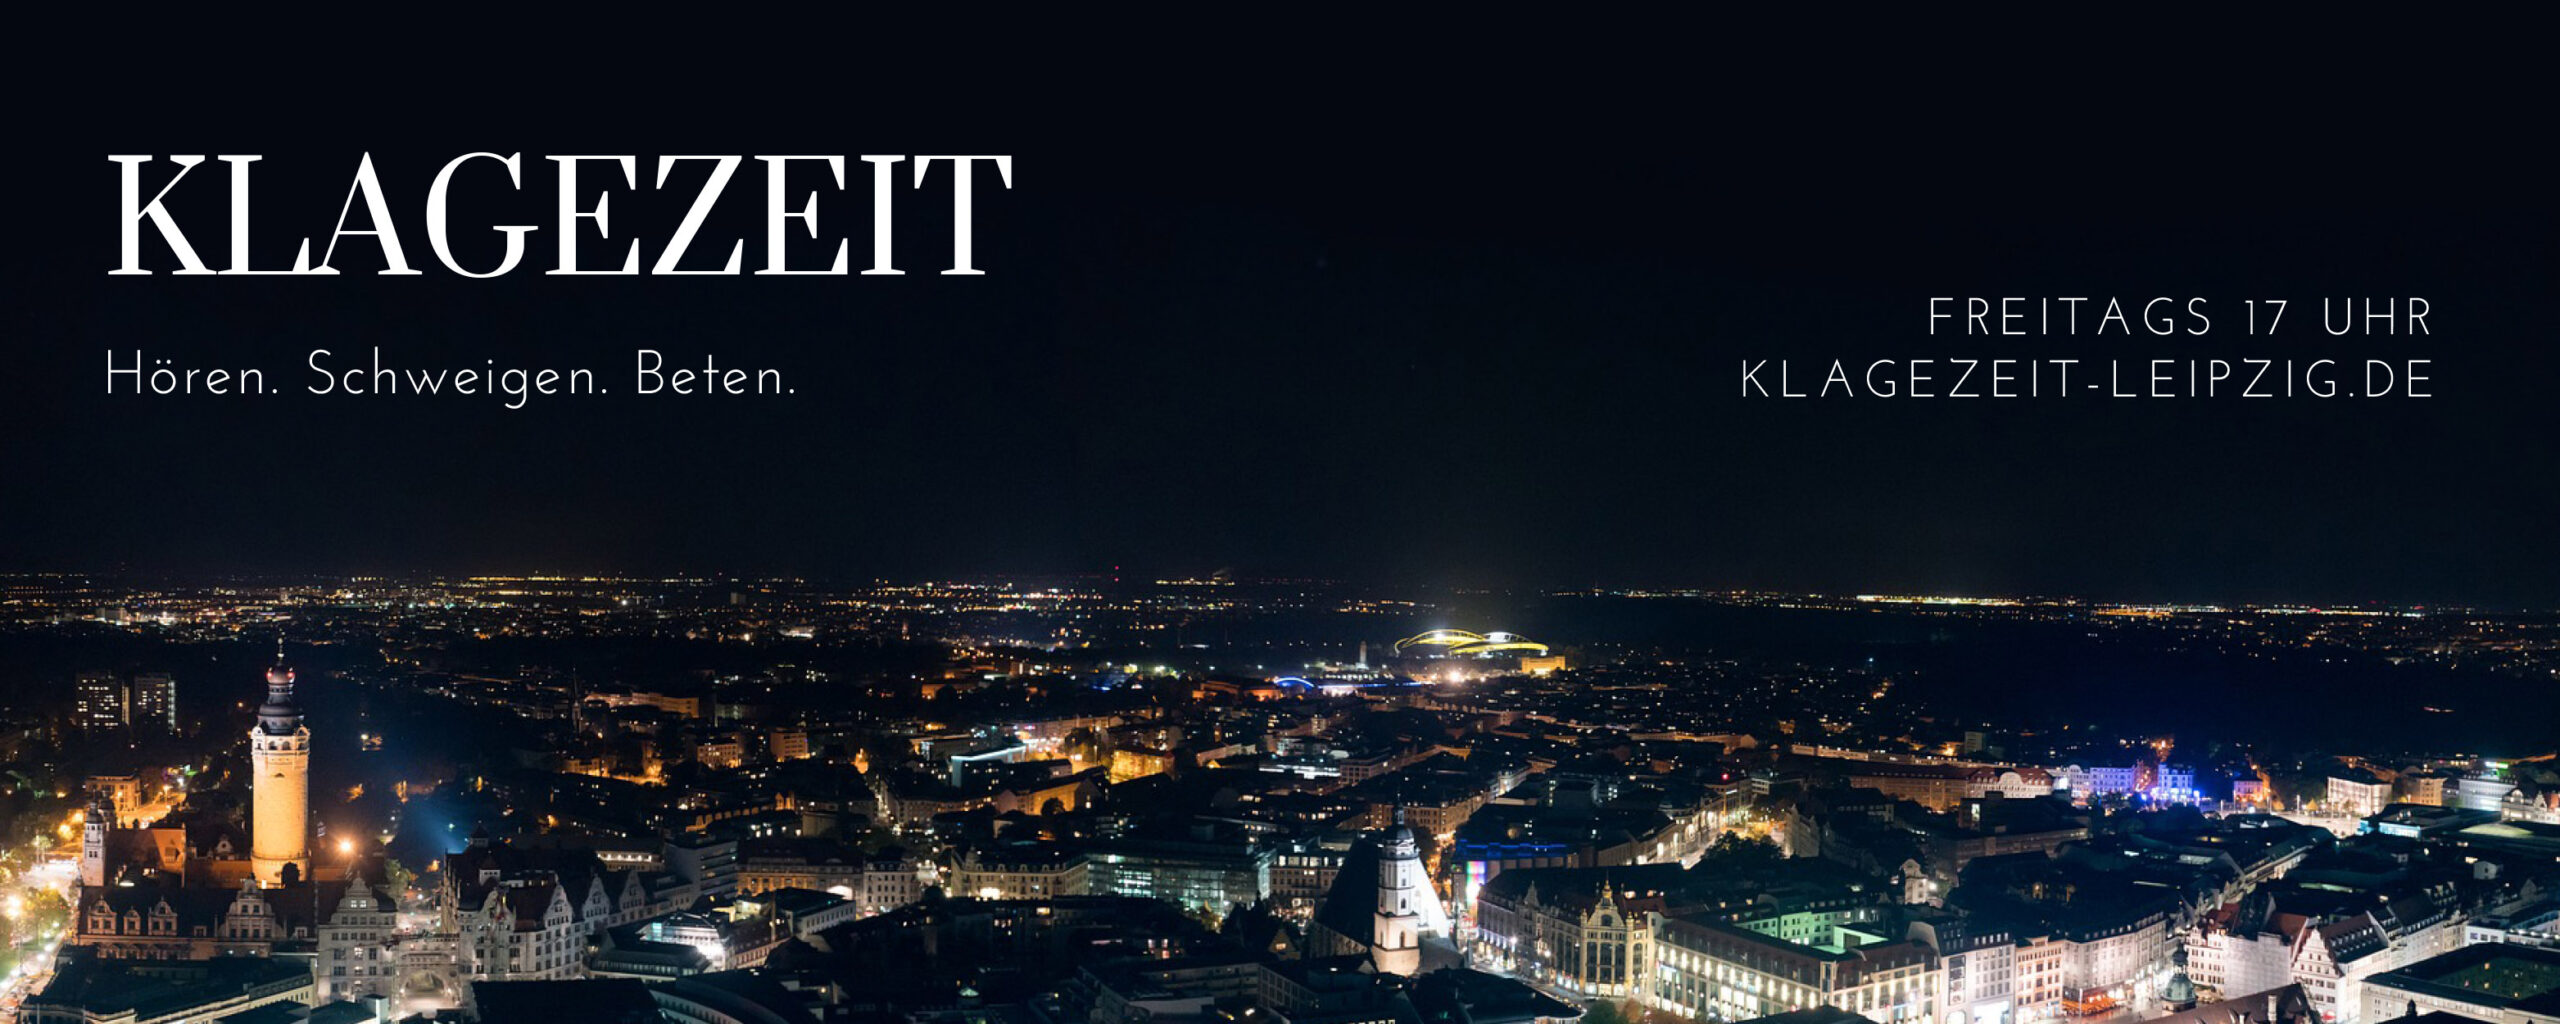 Klagezeit Leipzig Link